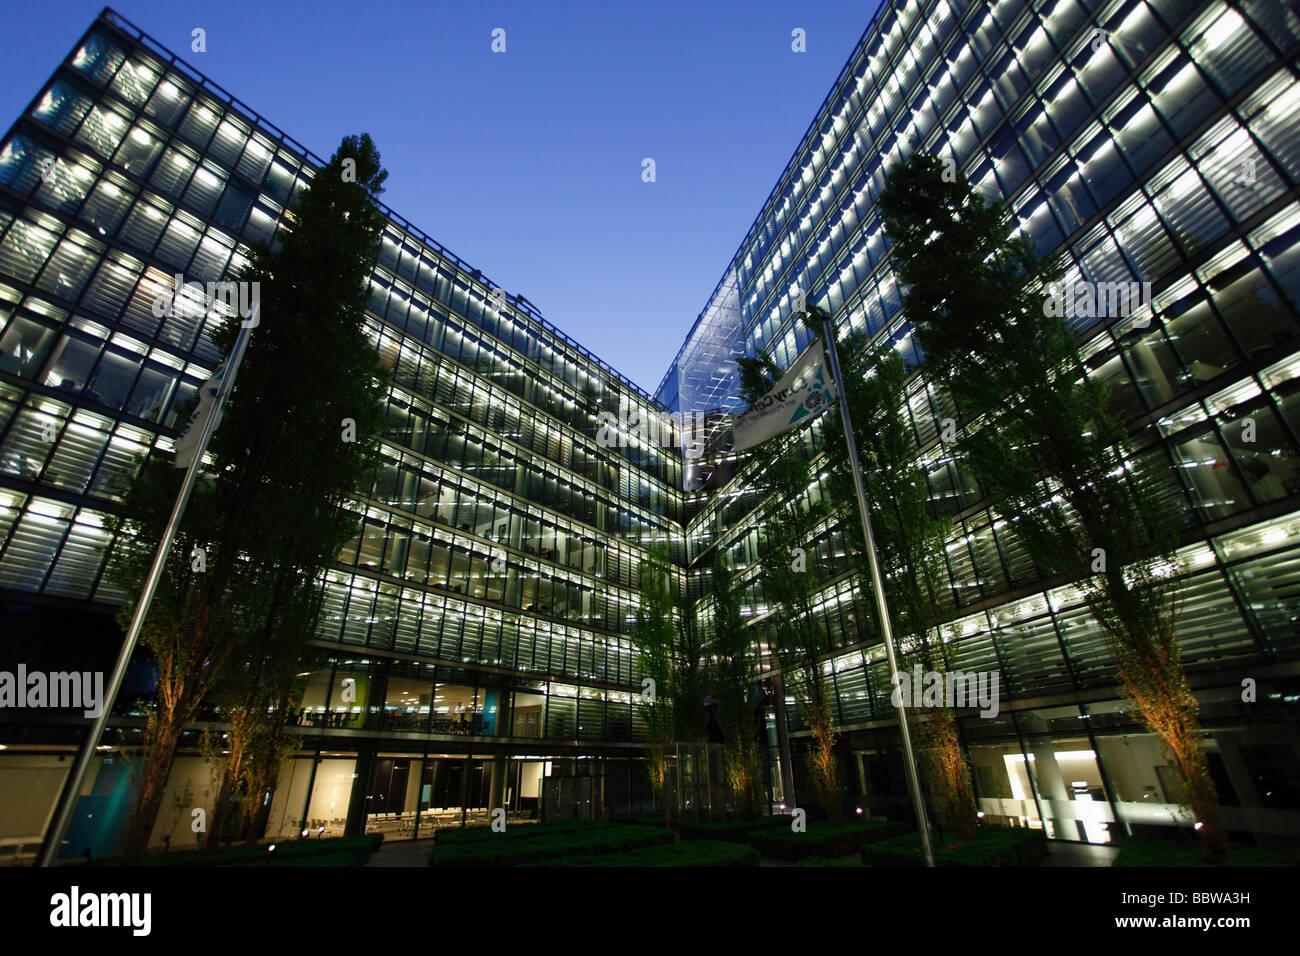 Germany berlin potsdamer platz modern architecture office building